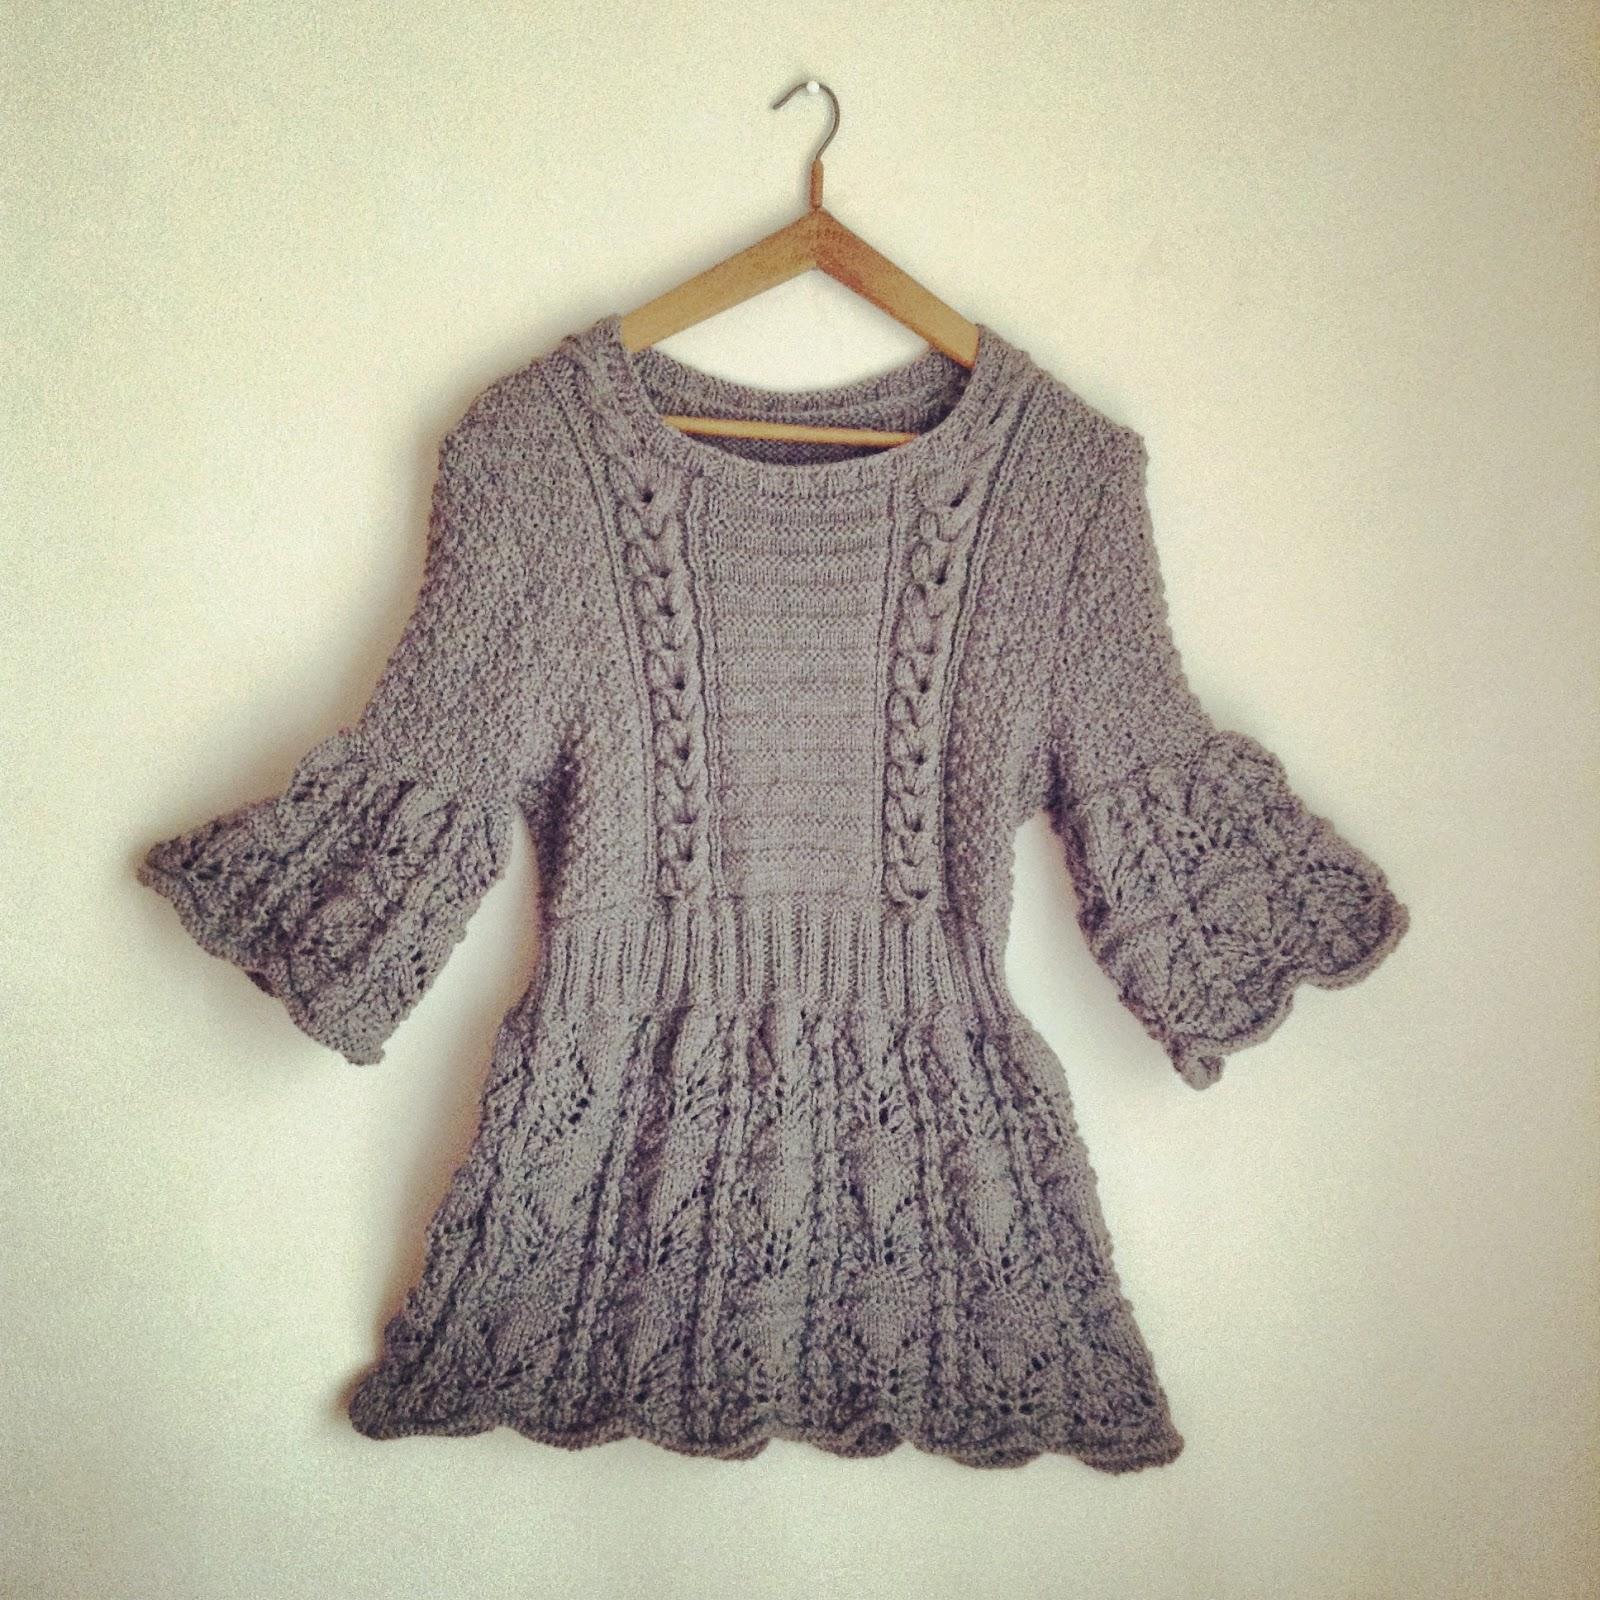 tricot tunique grise schachenmayr